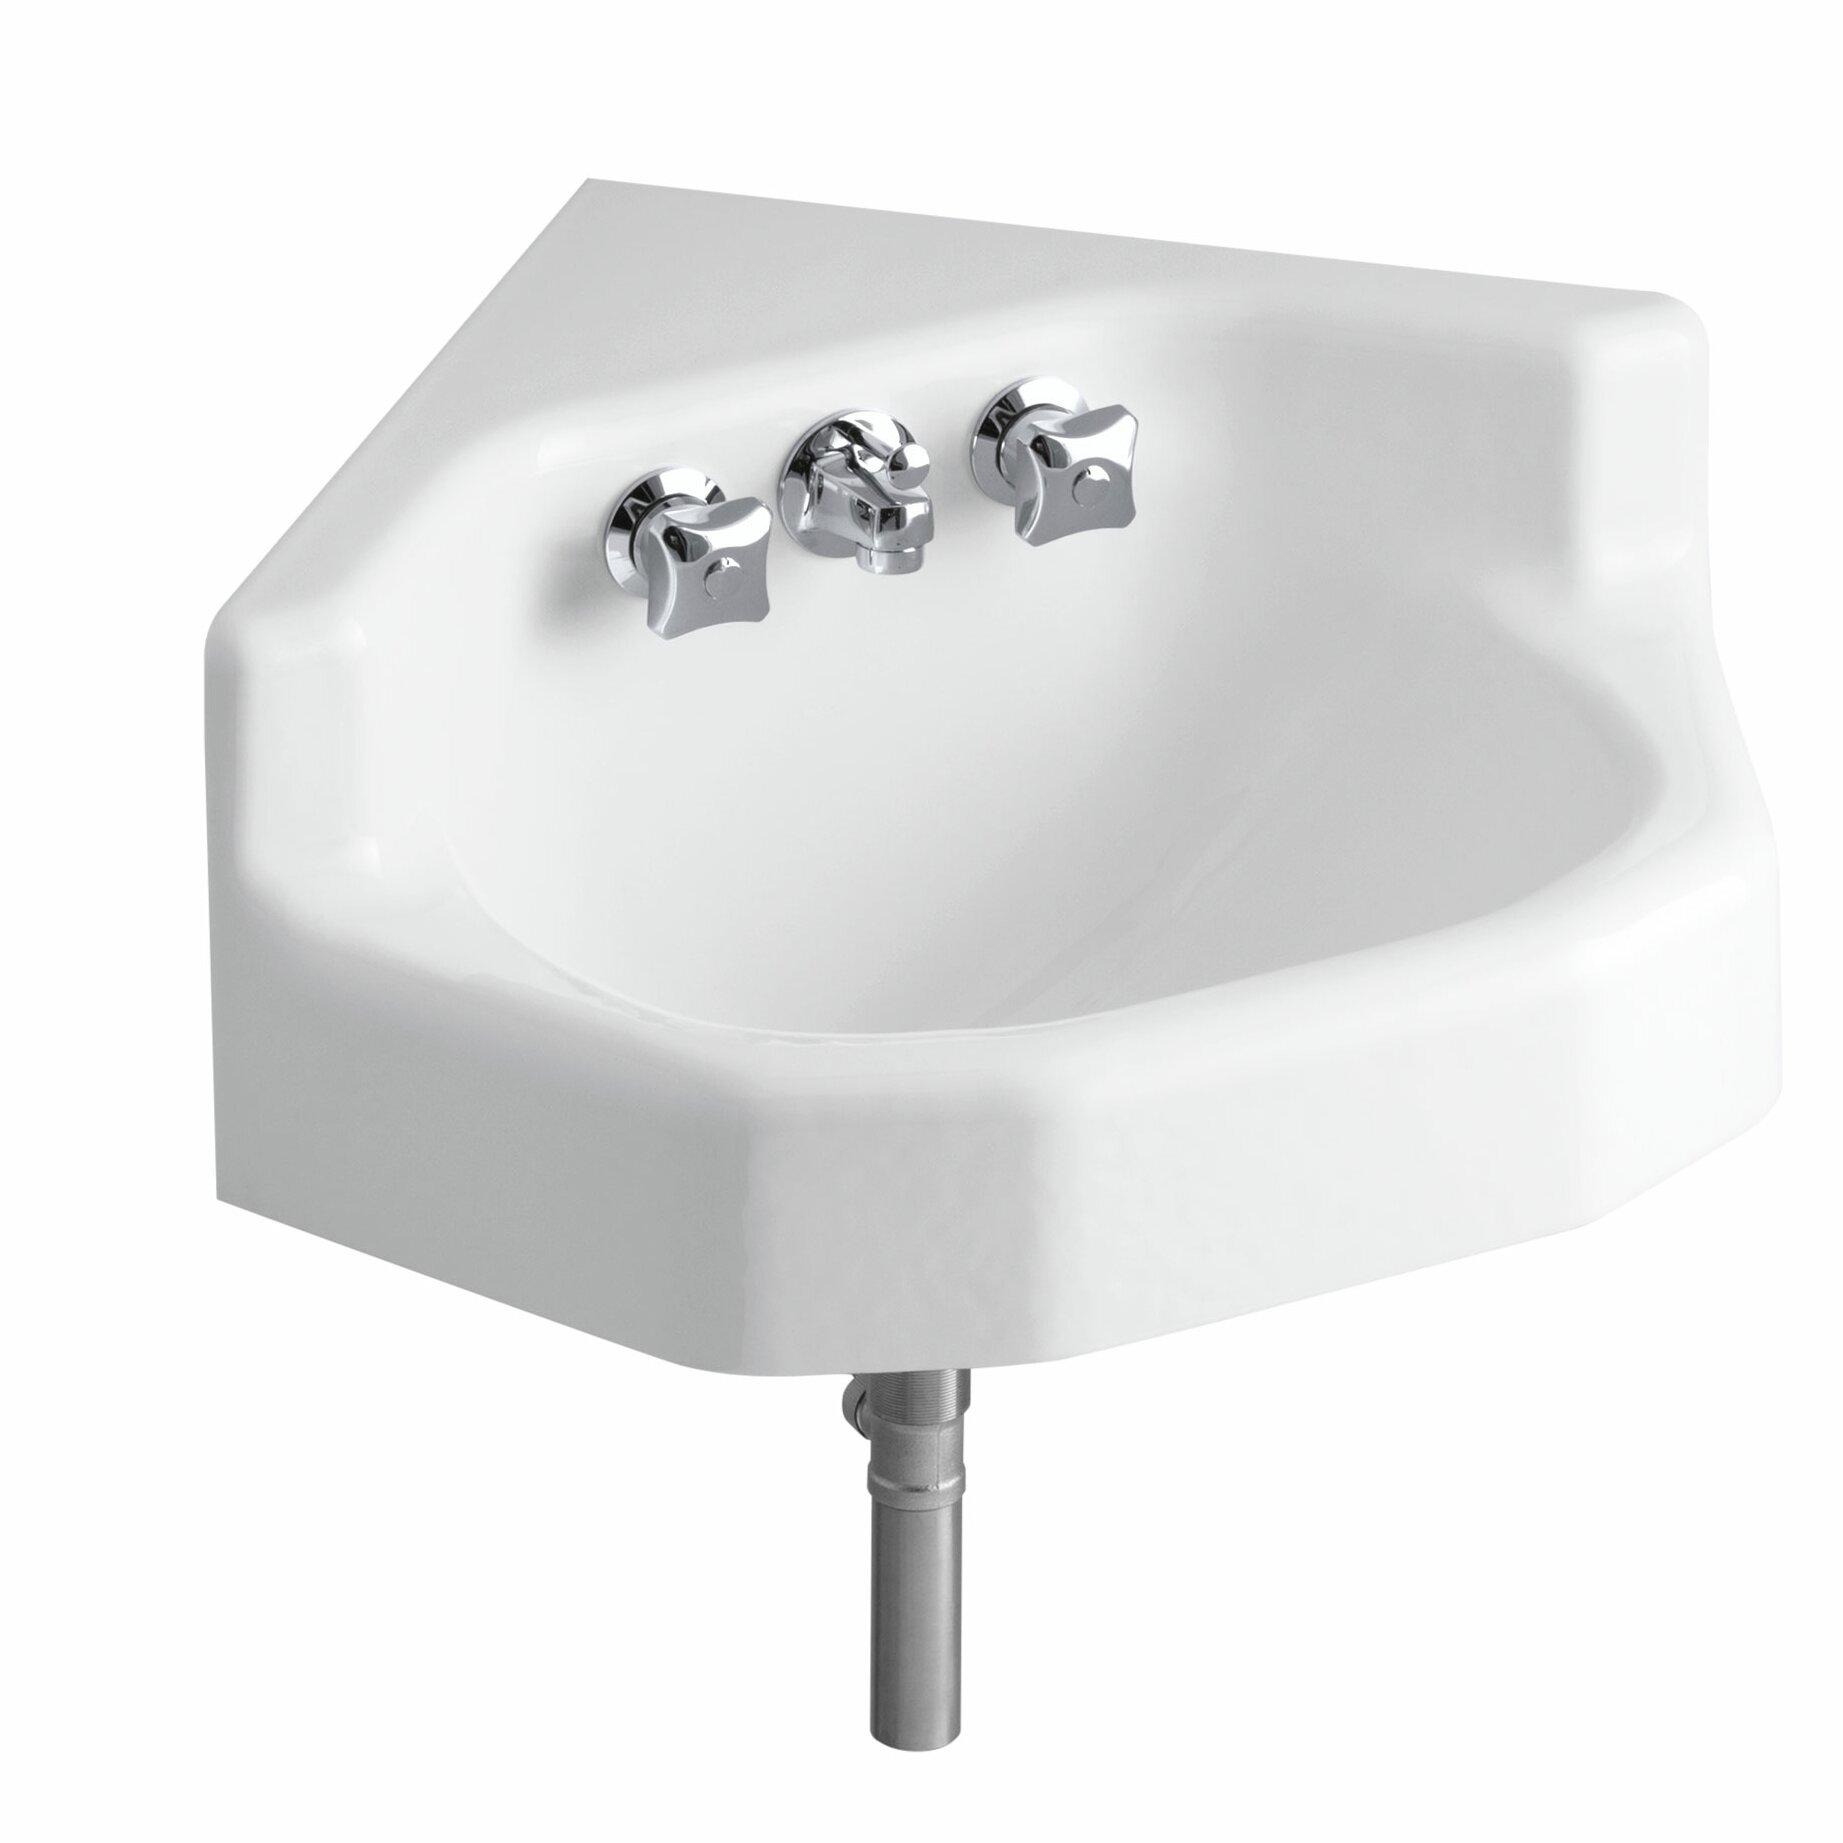 Kohler marston 16 x 16 corner wall mount shelf back - Kohler wall mount bathroom sink faucet ...